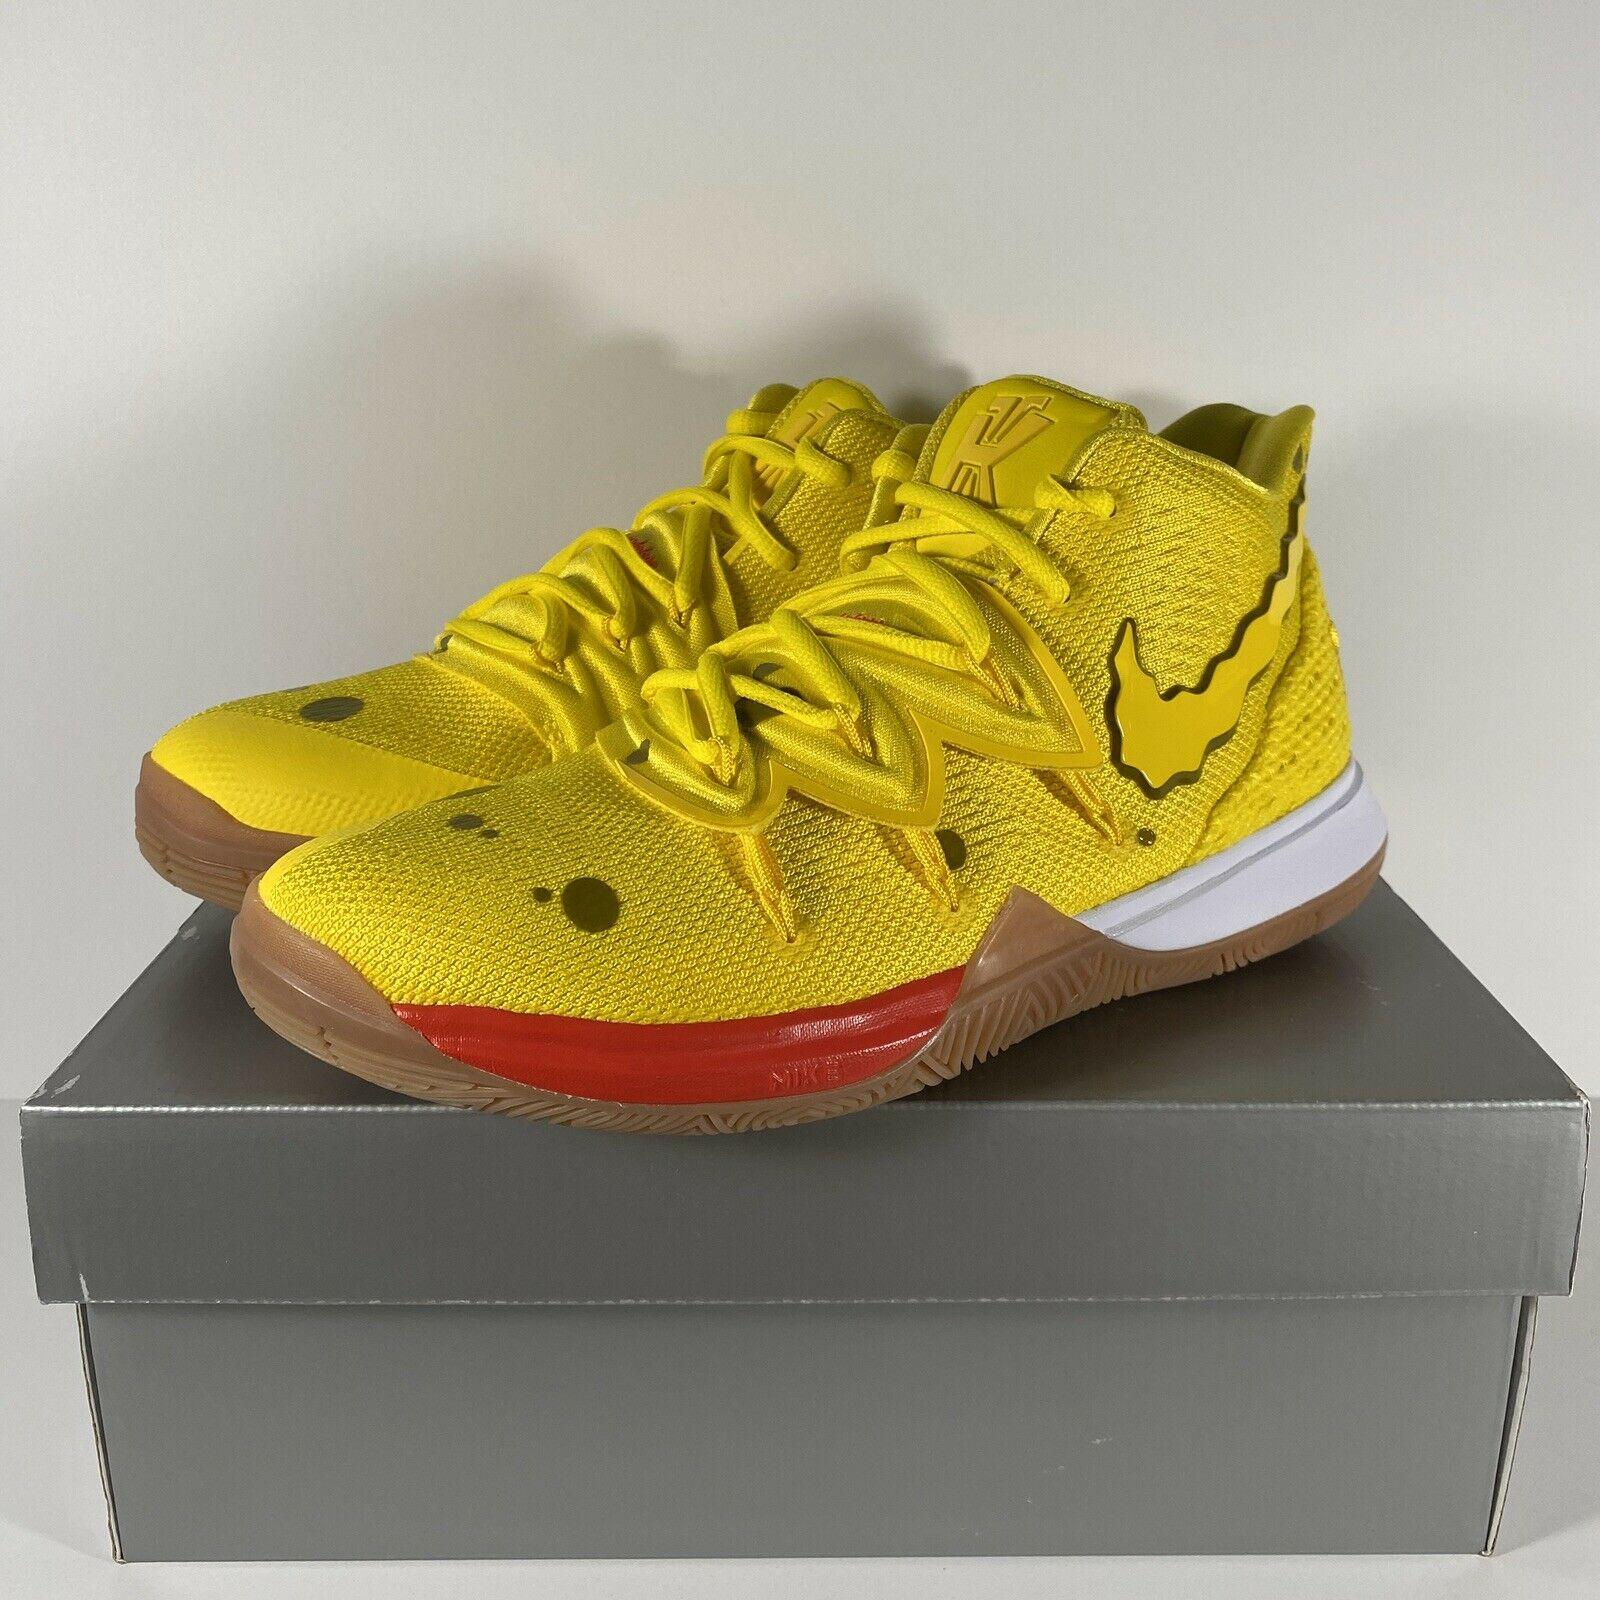 Nike Kyrie 5 Spongebob GS